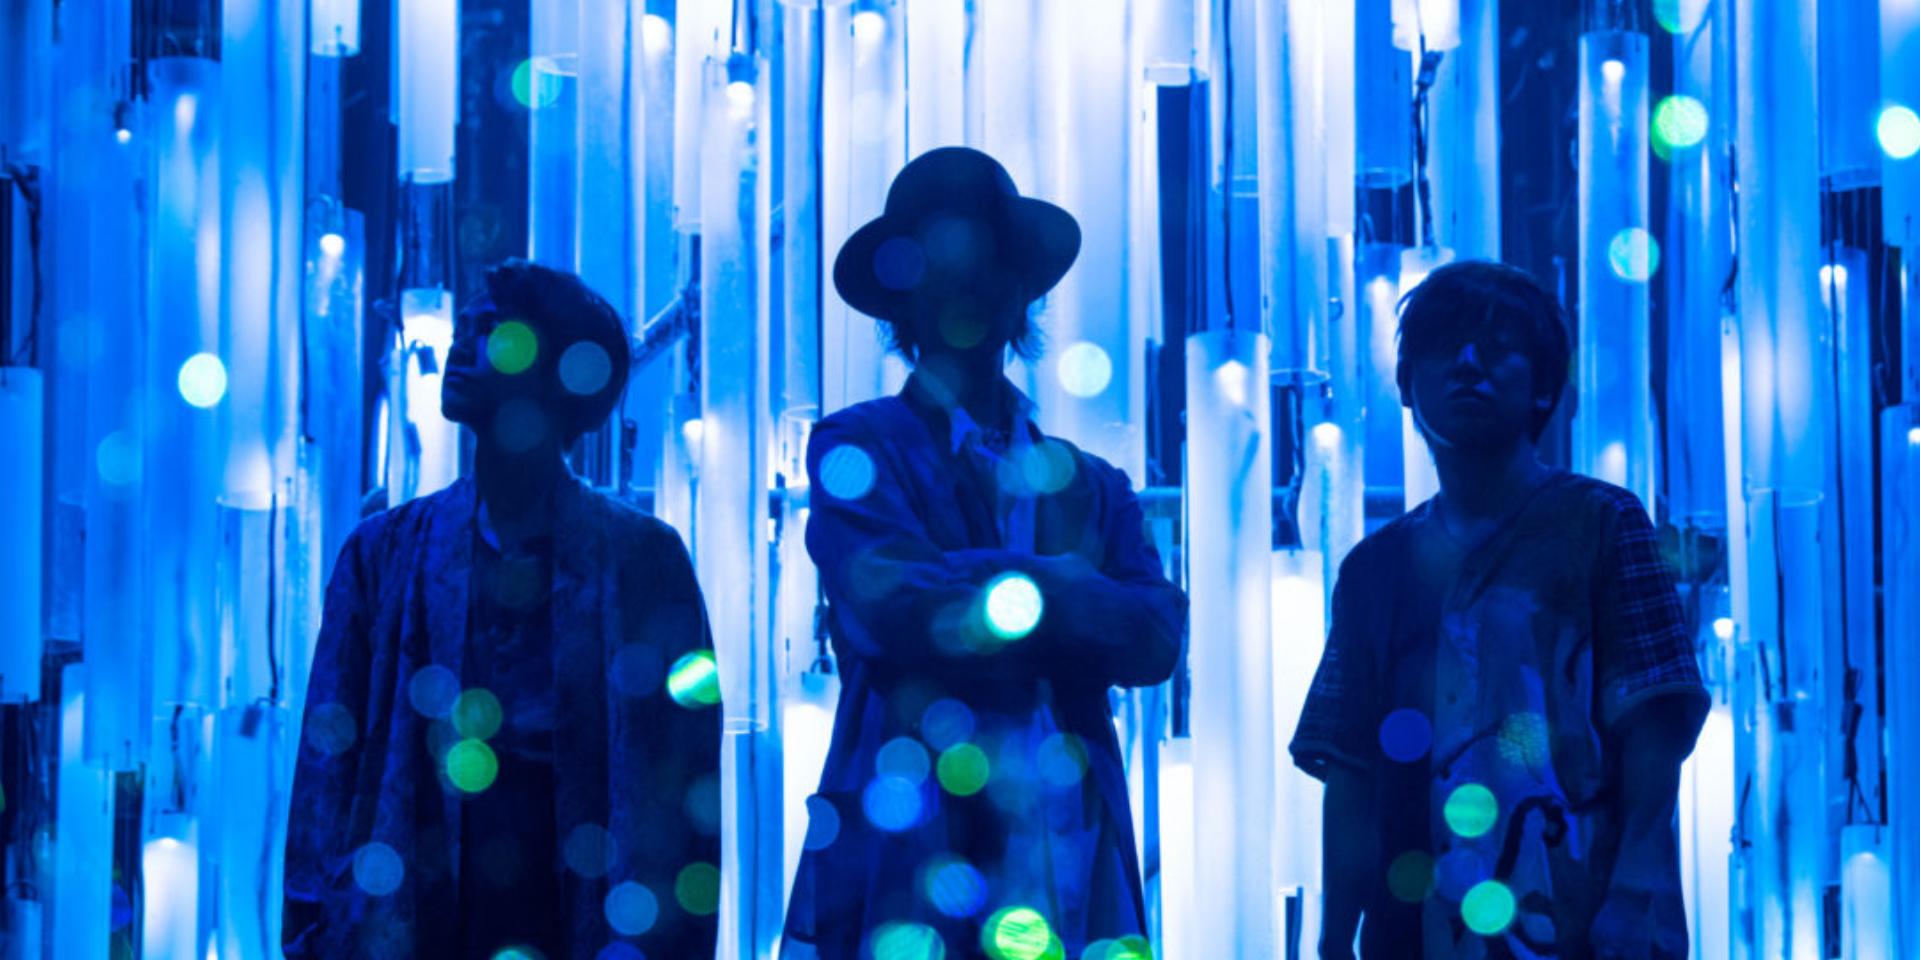 RADWIMPS to hold SHIN SEKAI 'nowhere' virtual experience this July